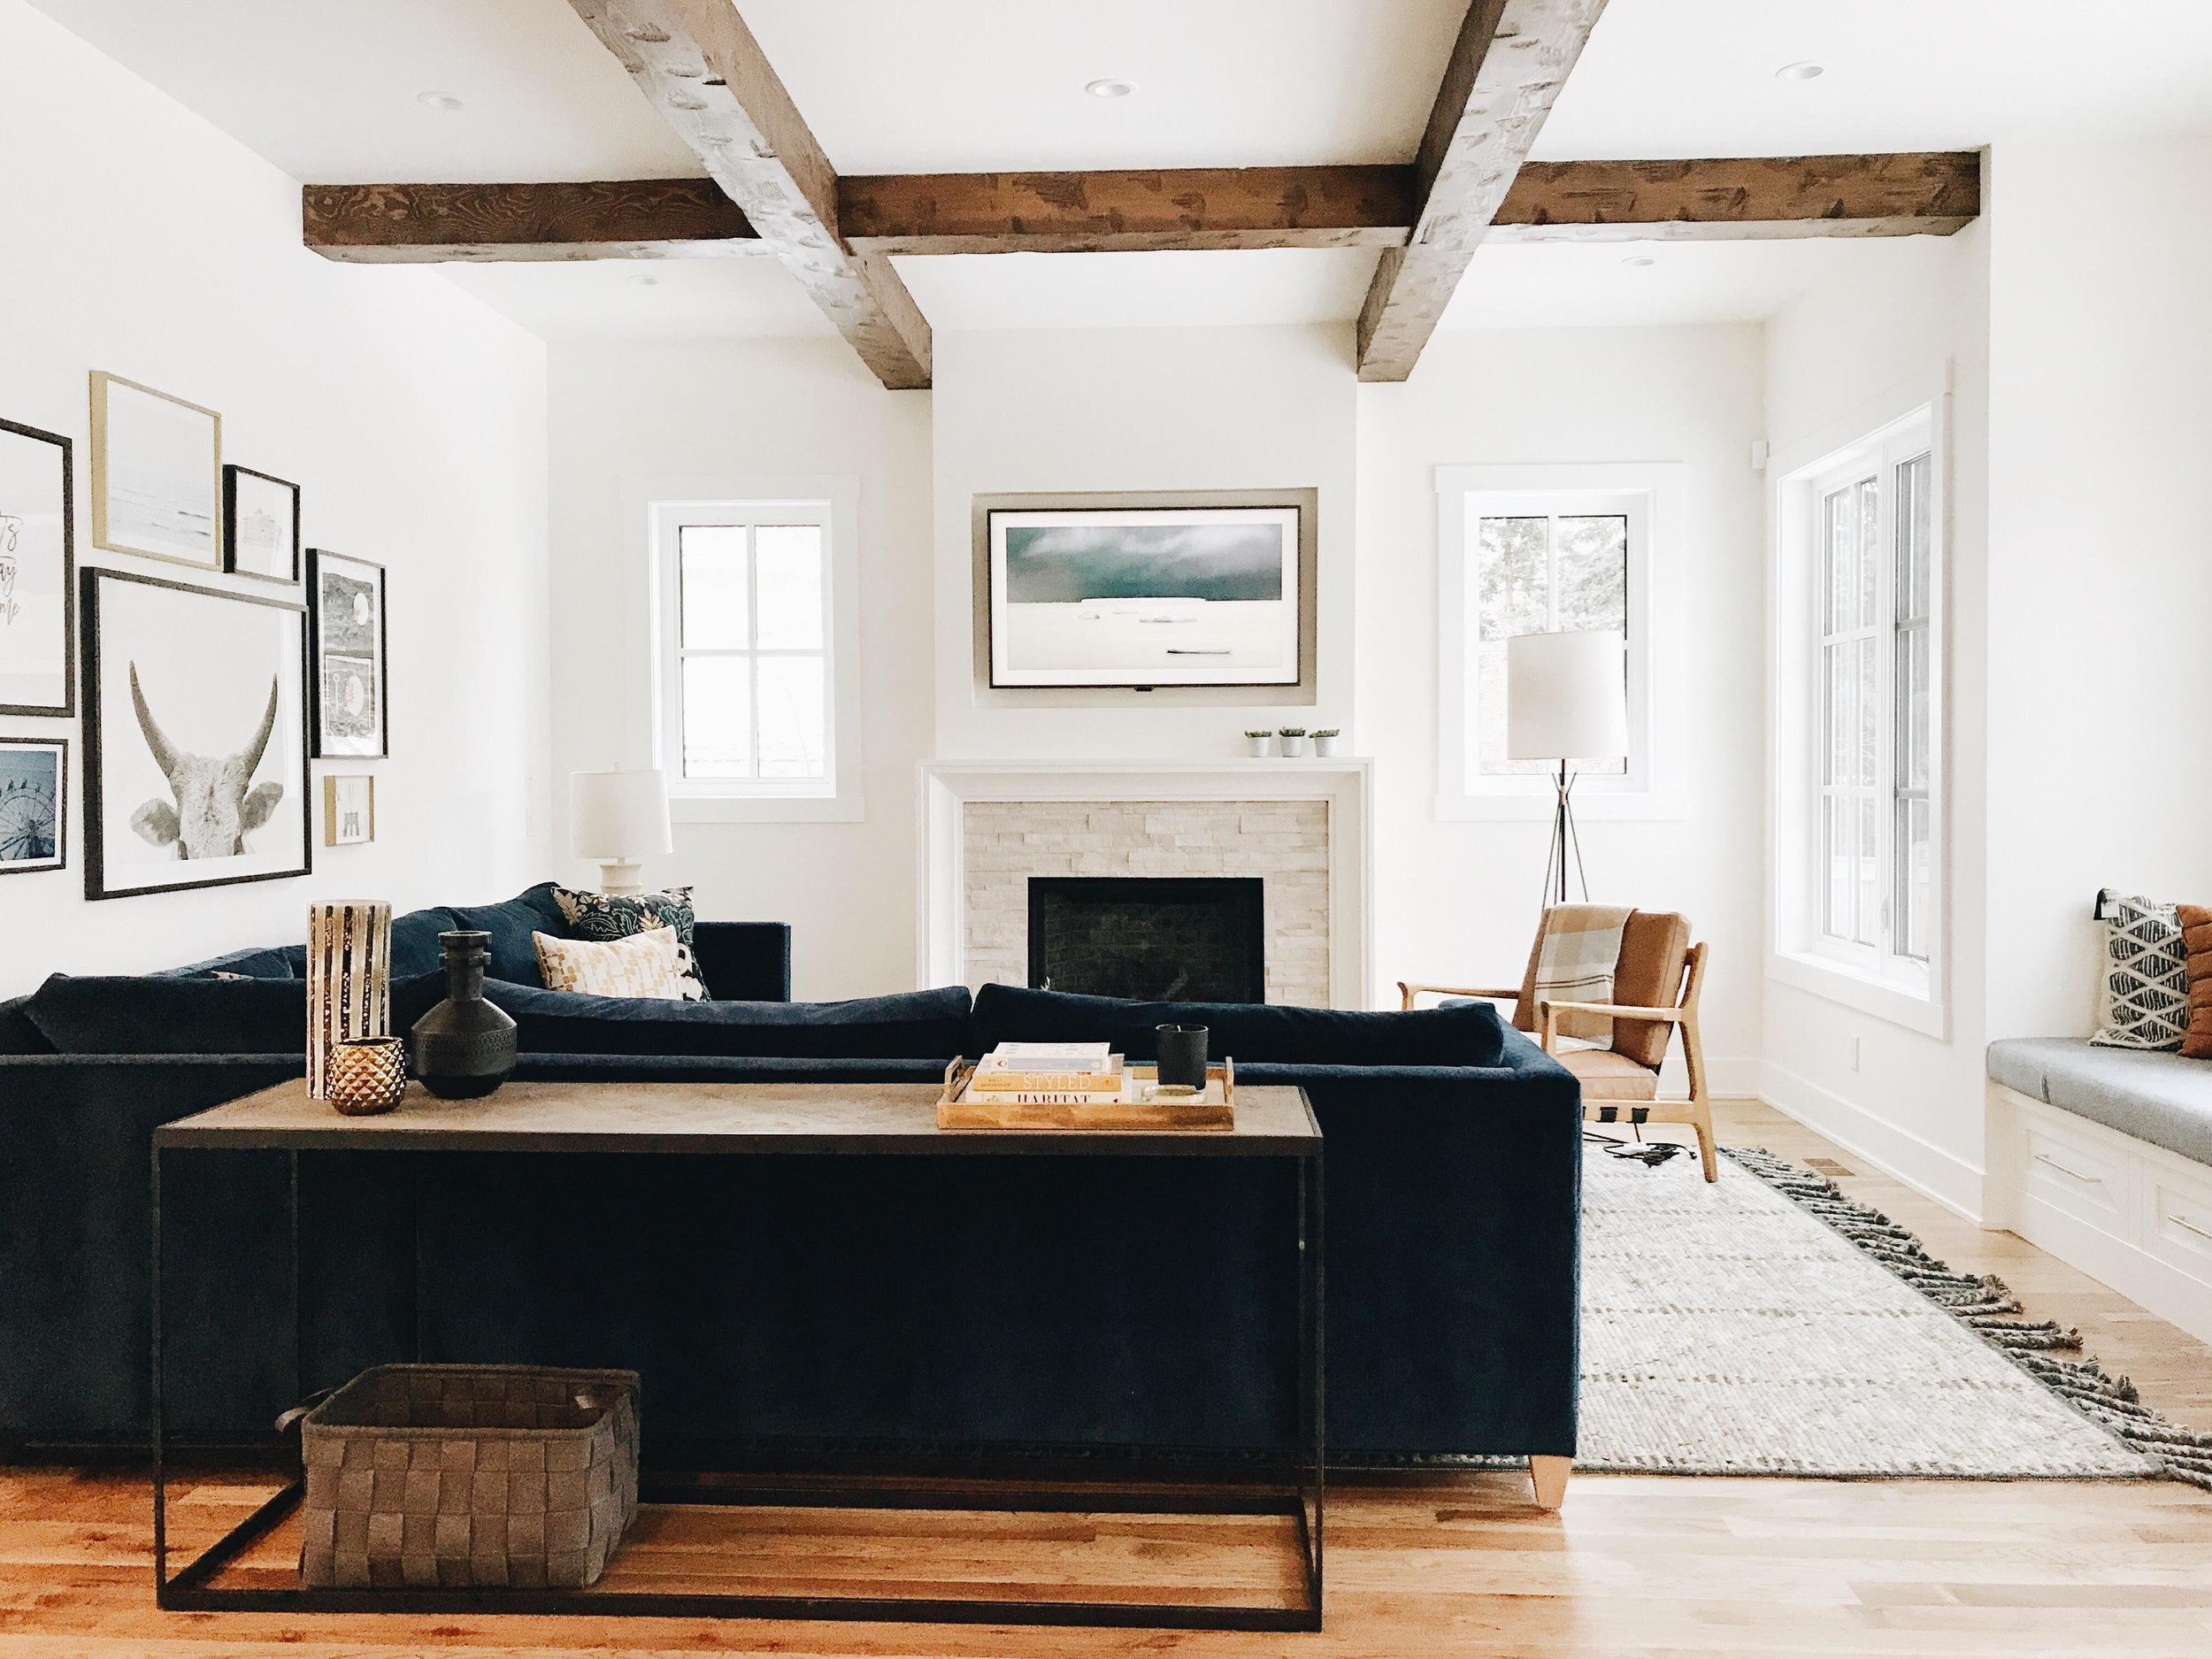 Before & After Family Room, Nyla Free Designs Inc., Calgary Interior Designer, Veranda Interiors Design | Build #nfdivarsityestates